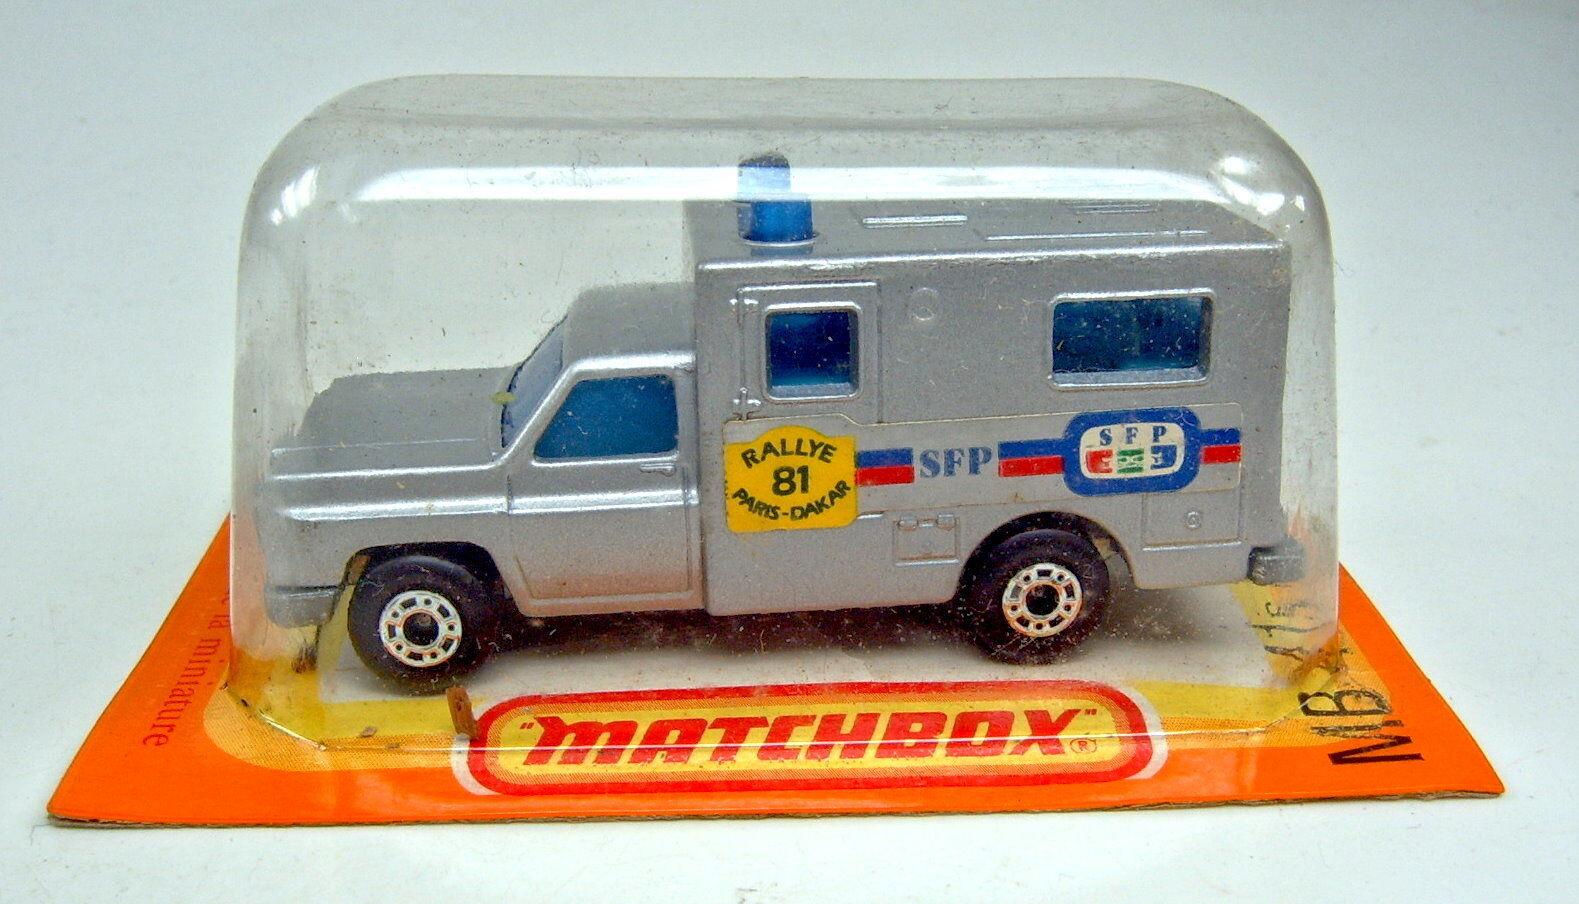 Matchbox Superfast nº 41c Ambulance argento  paris-dakar' 81  colección